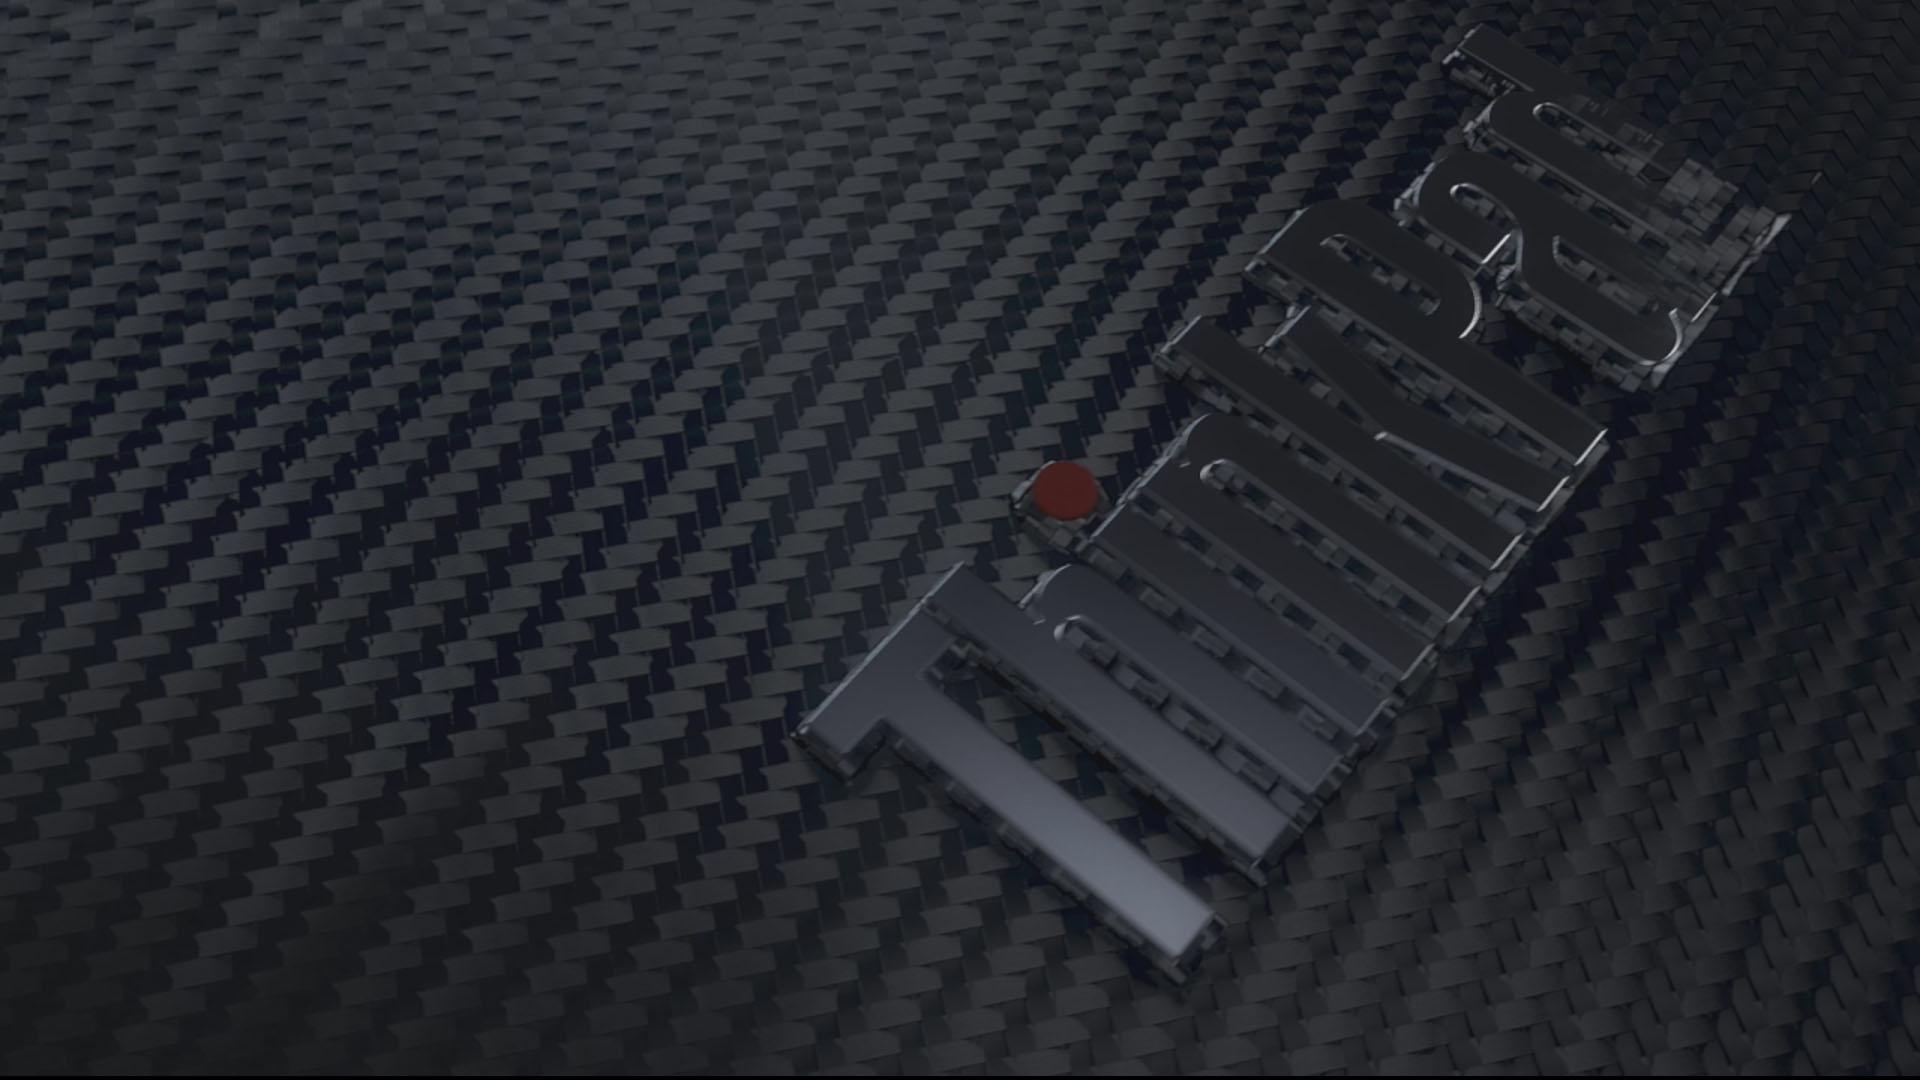 Lenovo ThinkPad X1 Carbon Ivan Vasiljevic 1920x1080